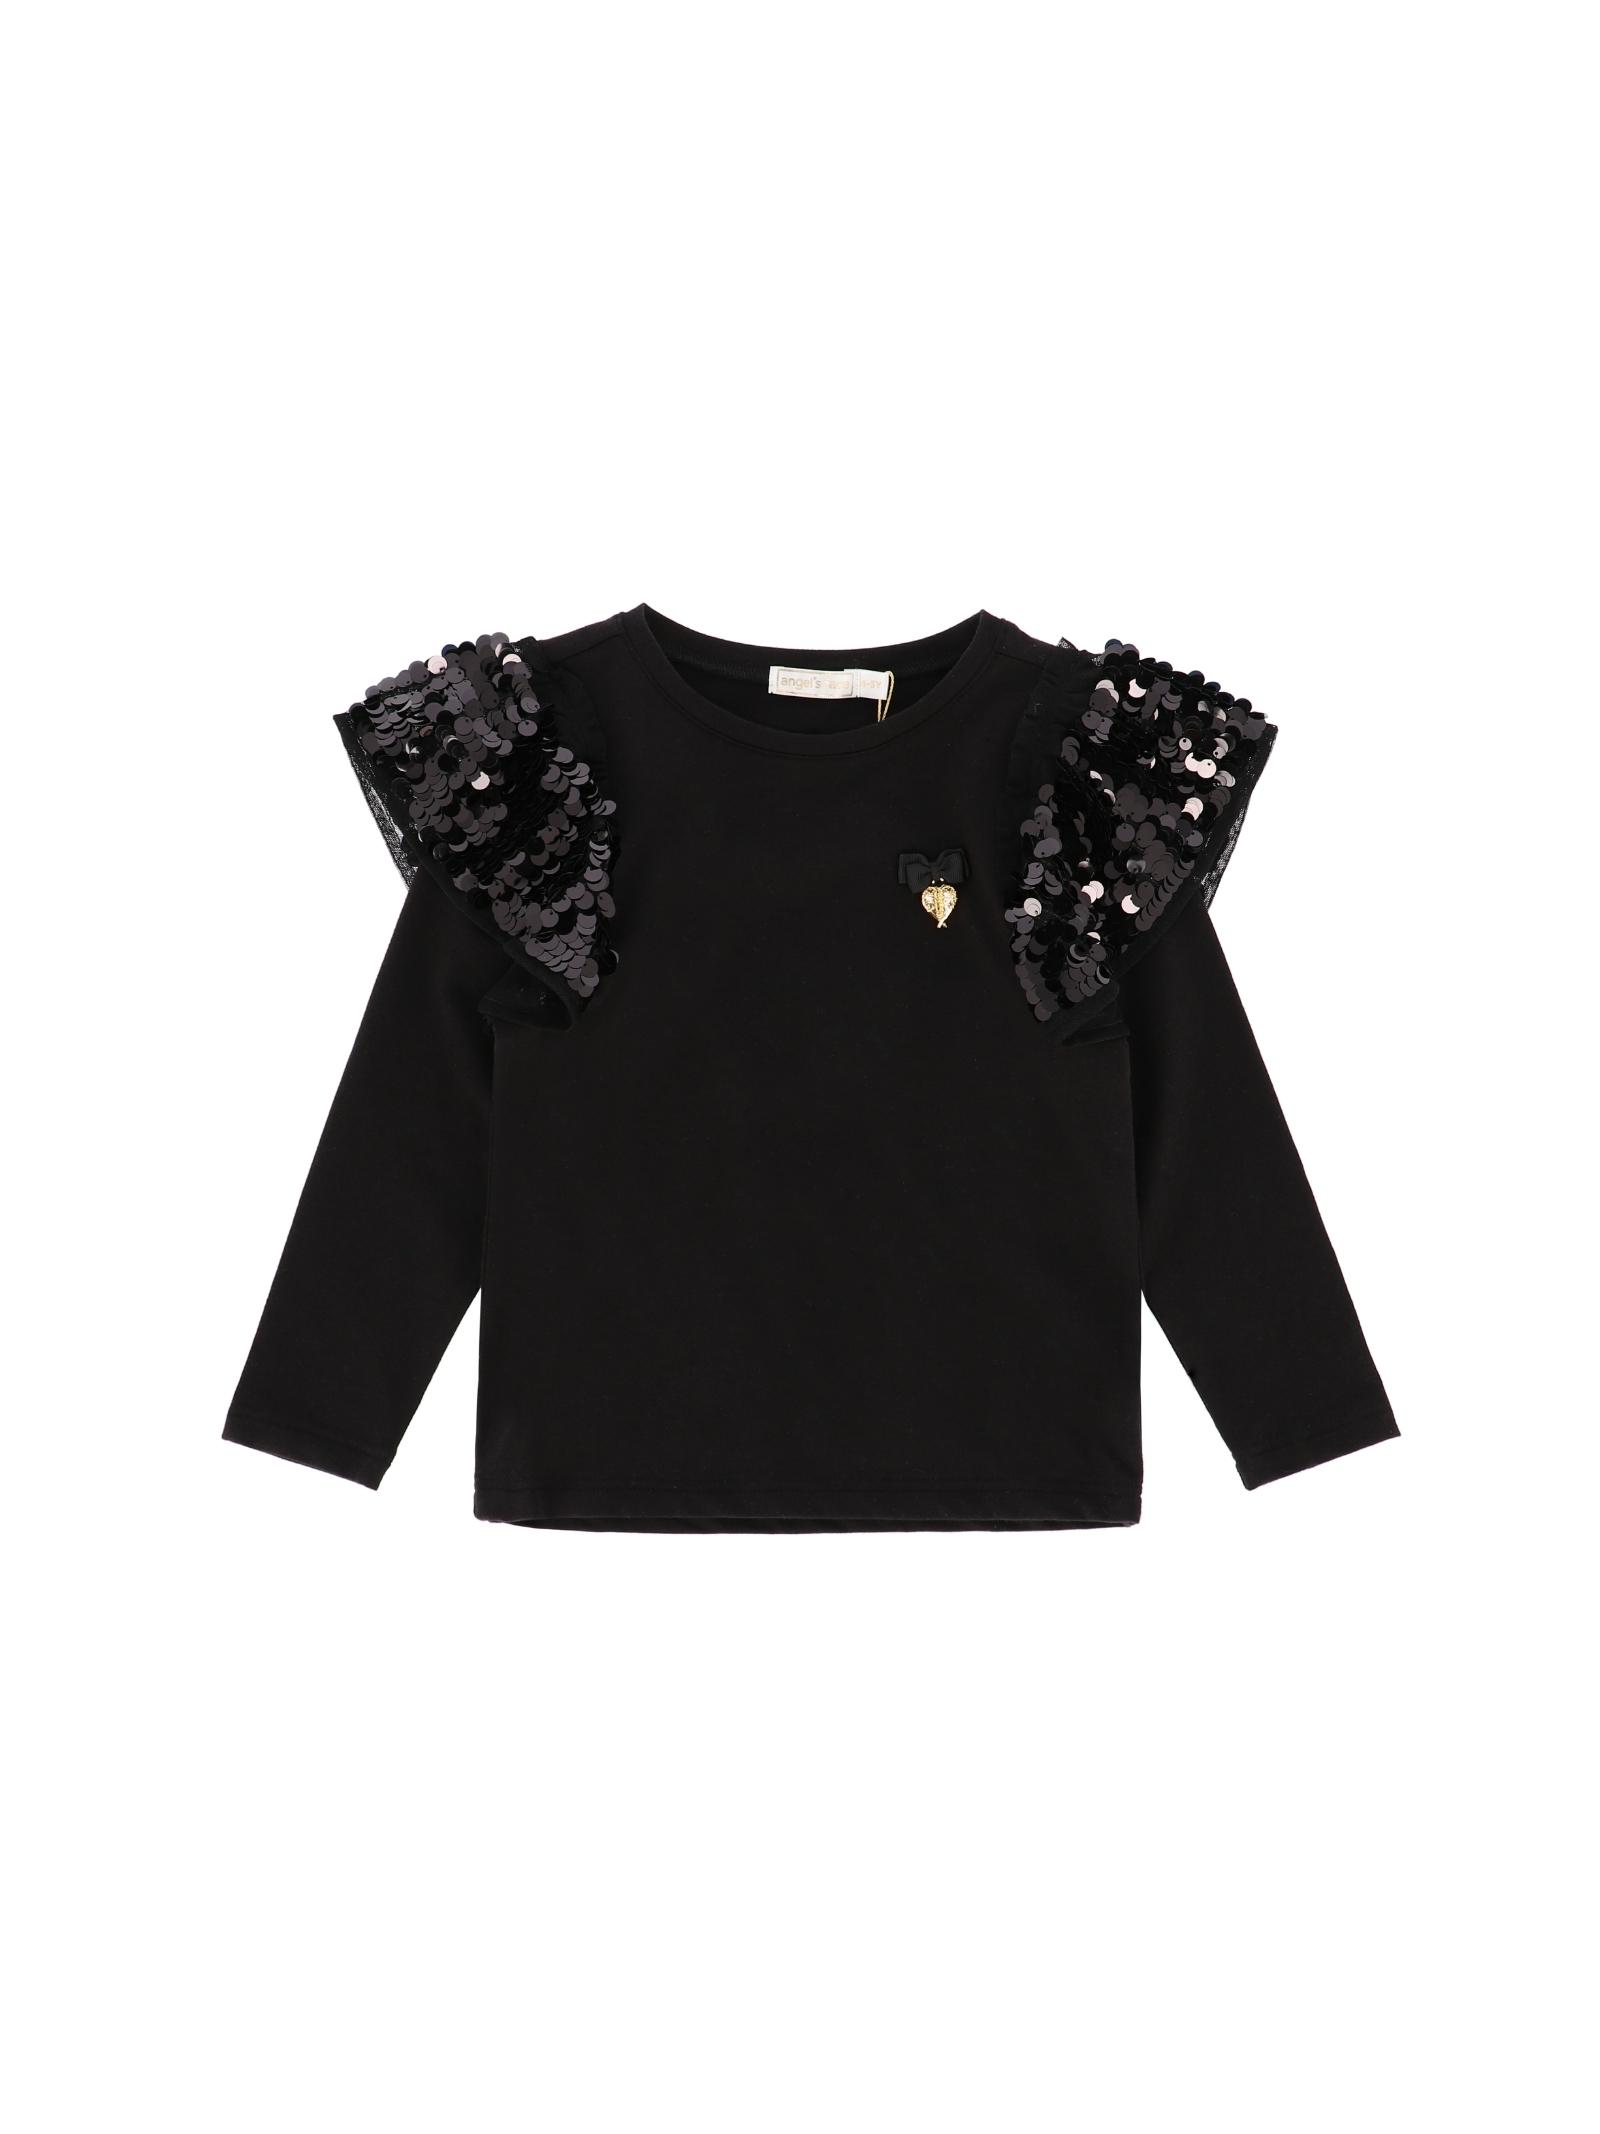 Cassia Paillettes Girl Sweater ANGEL'S FACE |  | CASSIABLACK